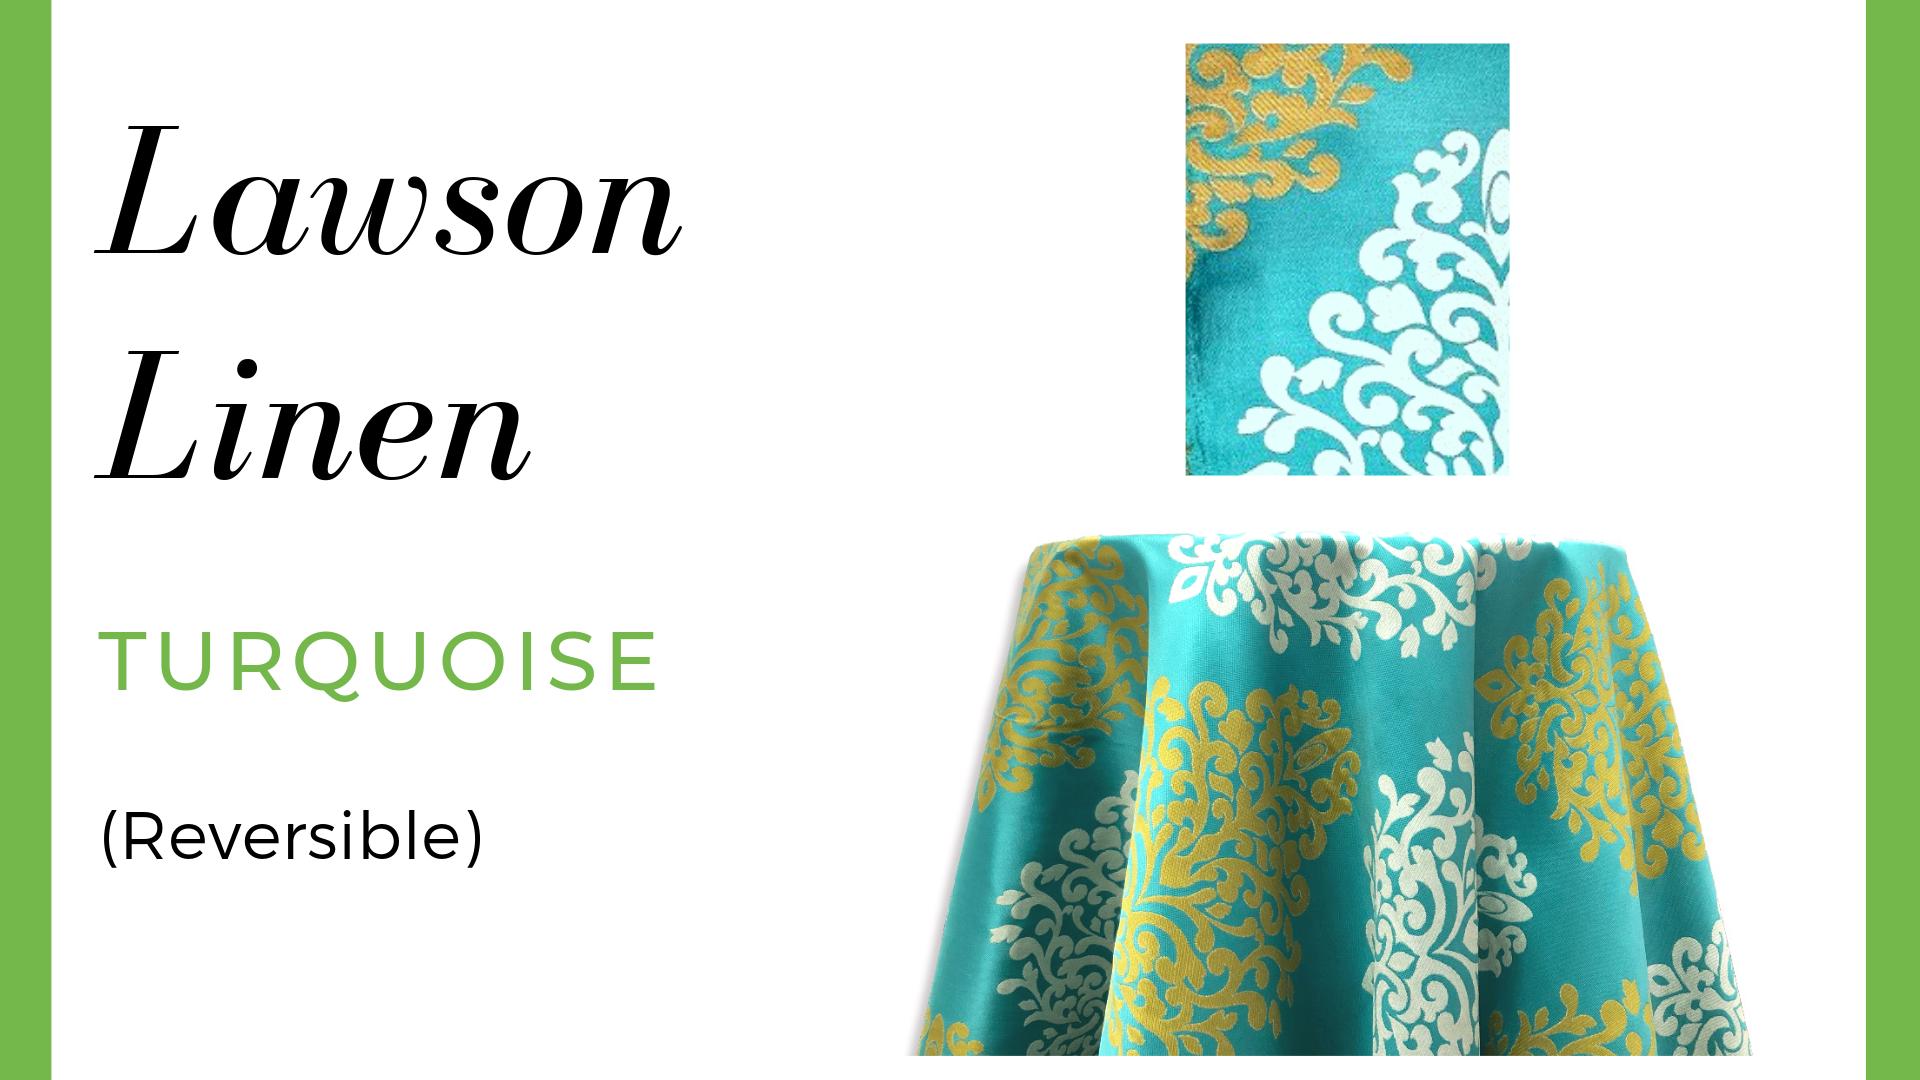 Lawson Linen - Turquoise (Reversible)